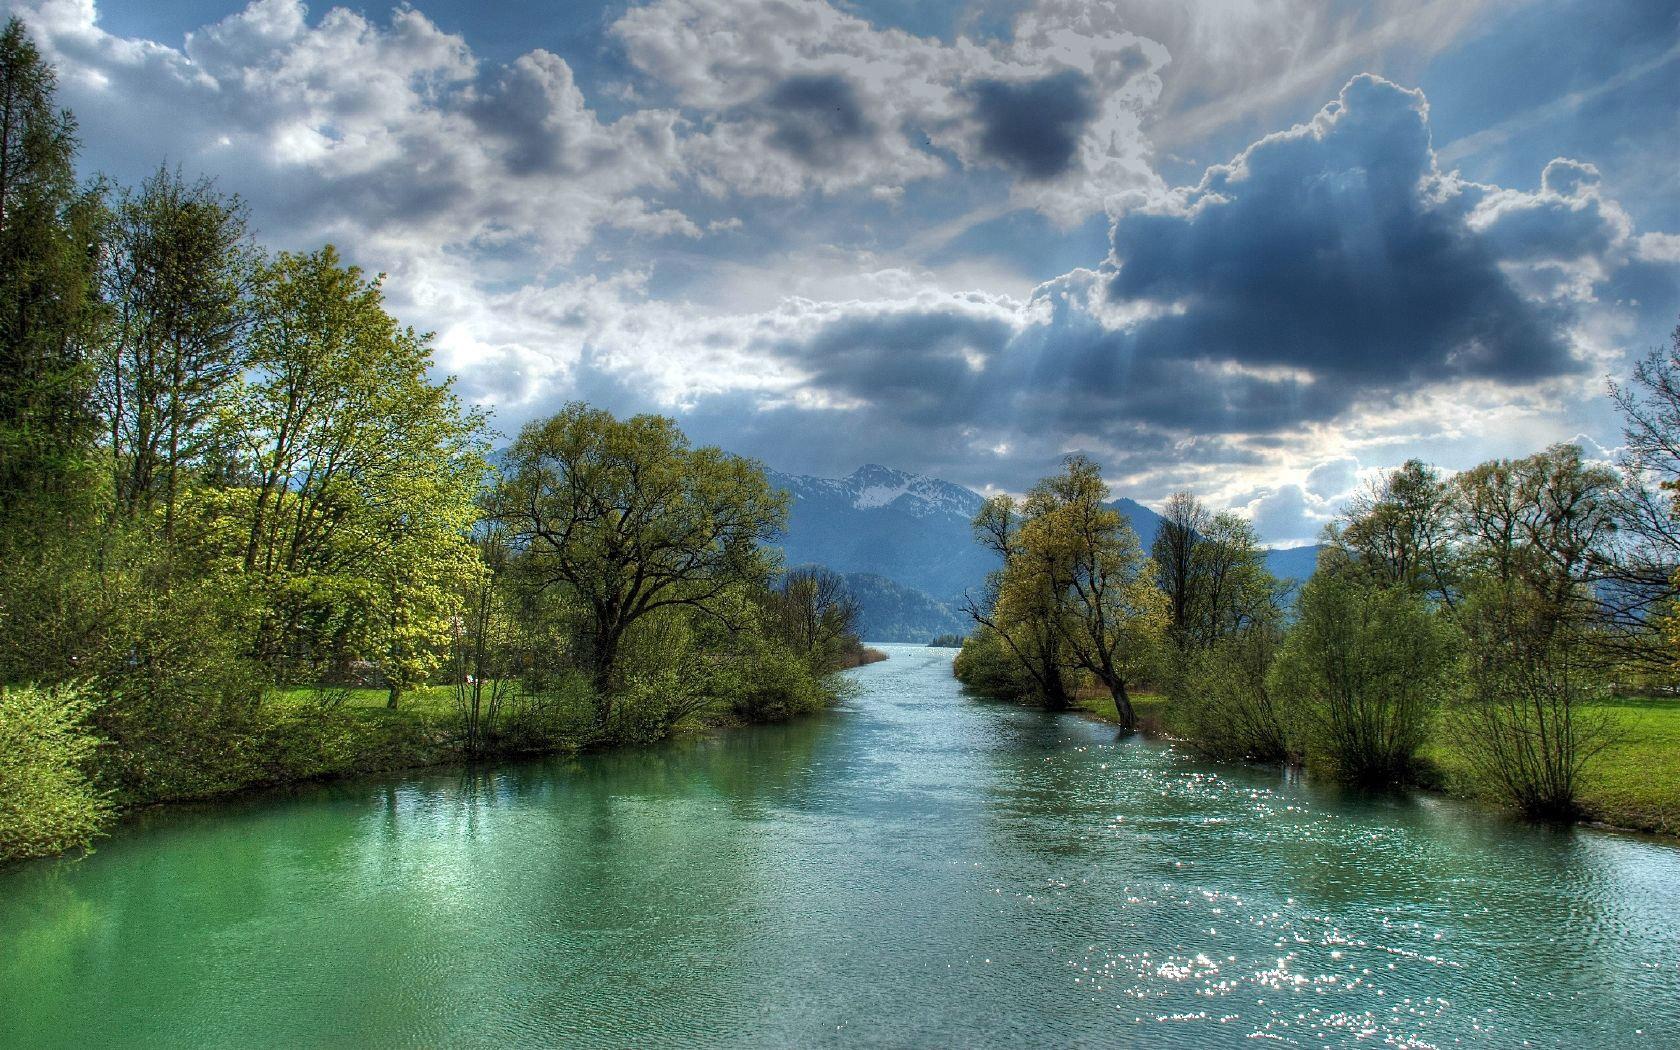 river life sunshine nature sky